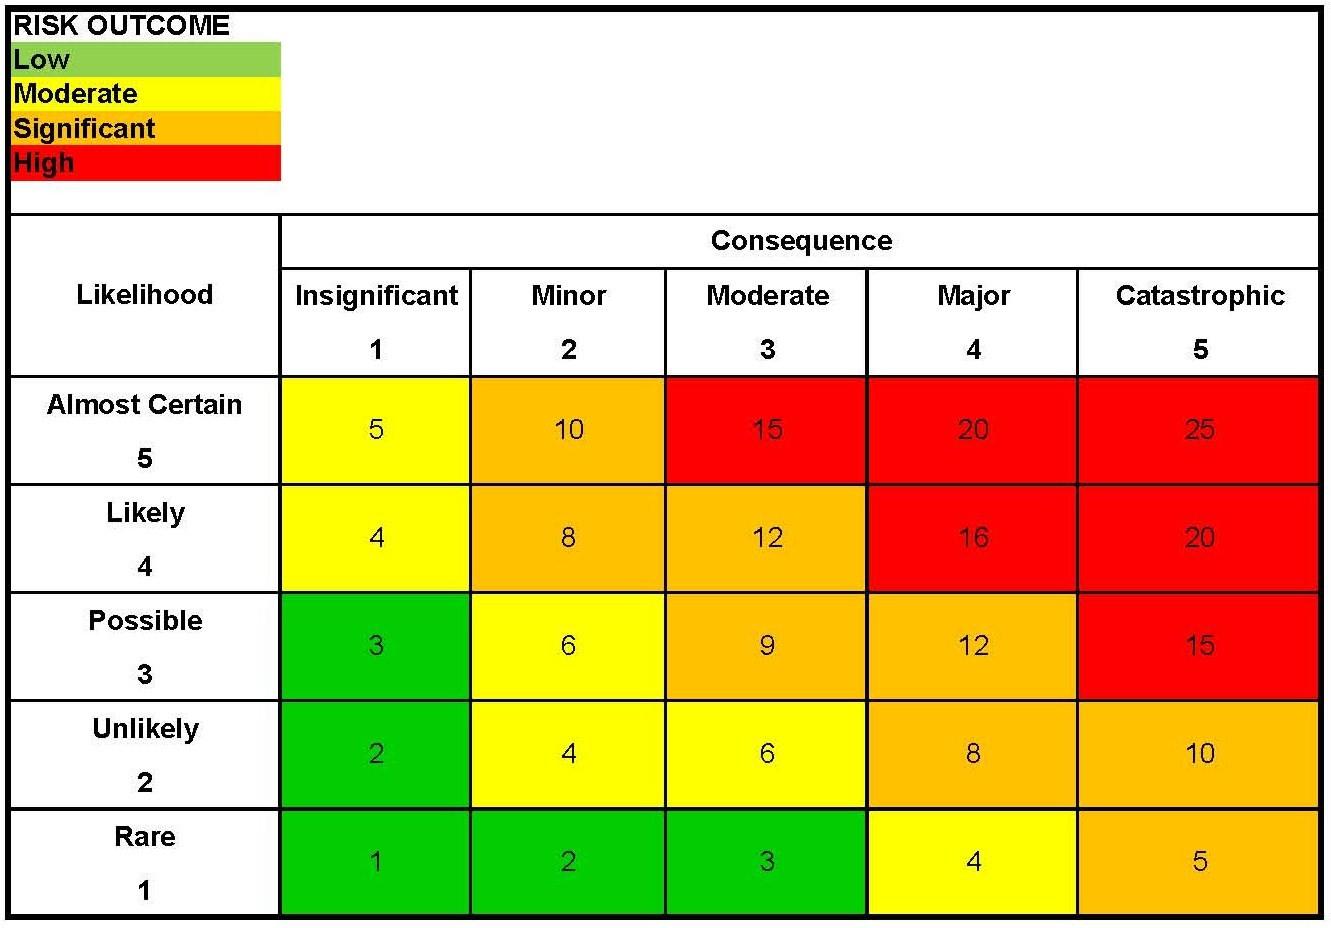 Quantitative Risk Assessment Matrix Pictures To Pin